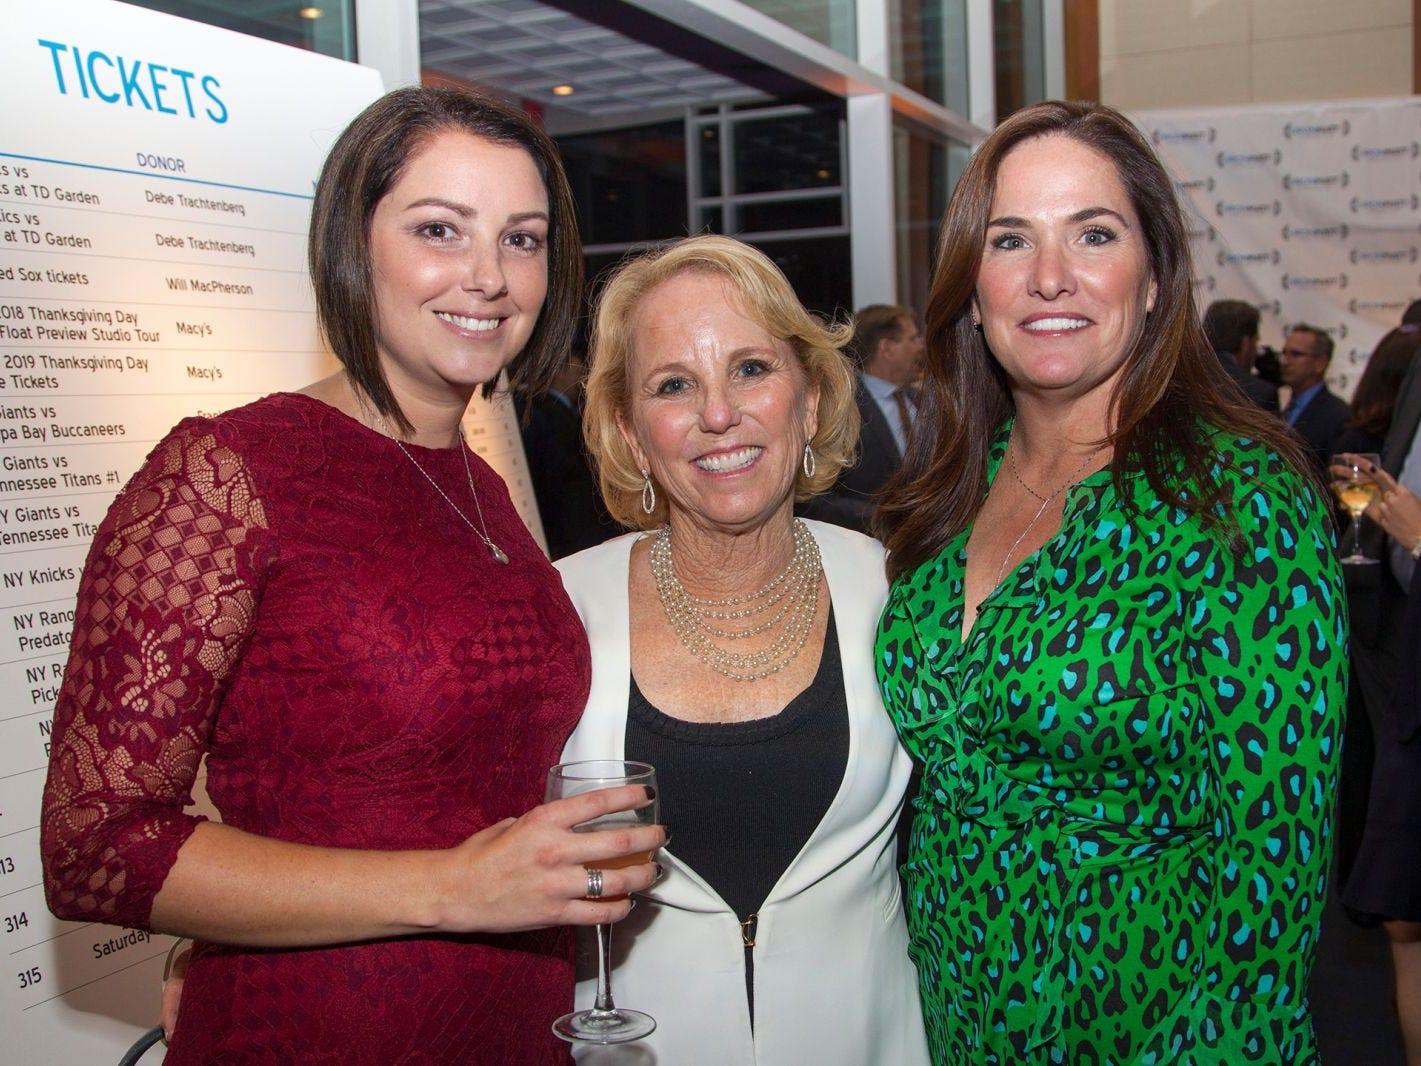 Michelle Ackermann, Kerry Bascio, Kelly Larson. 11th annual IronMatt Fundraiser Gala at Pier 60 Chelsea Piers. 09/20/2018